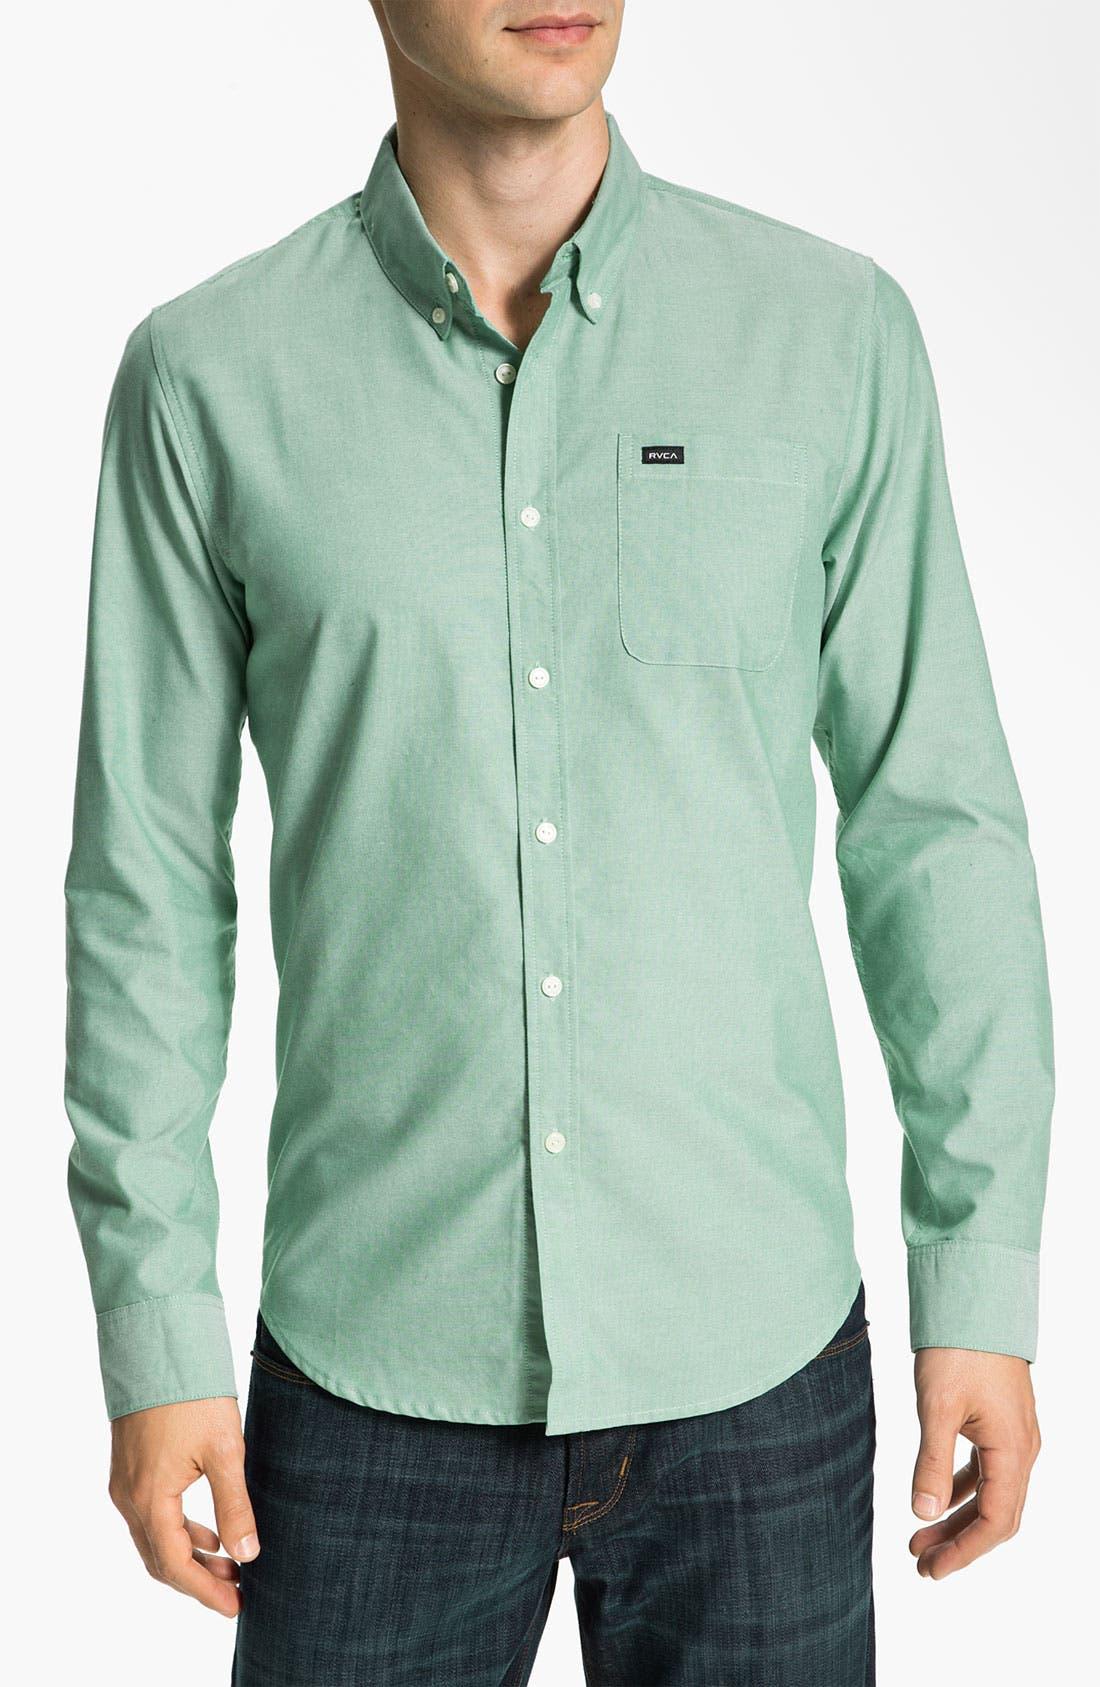 Main Image - RVCA 'That'll Do' Oxford Shirt